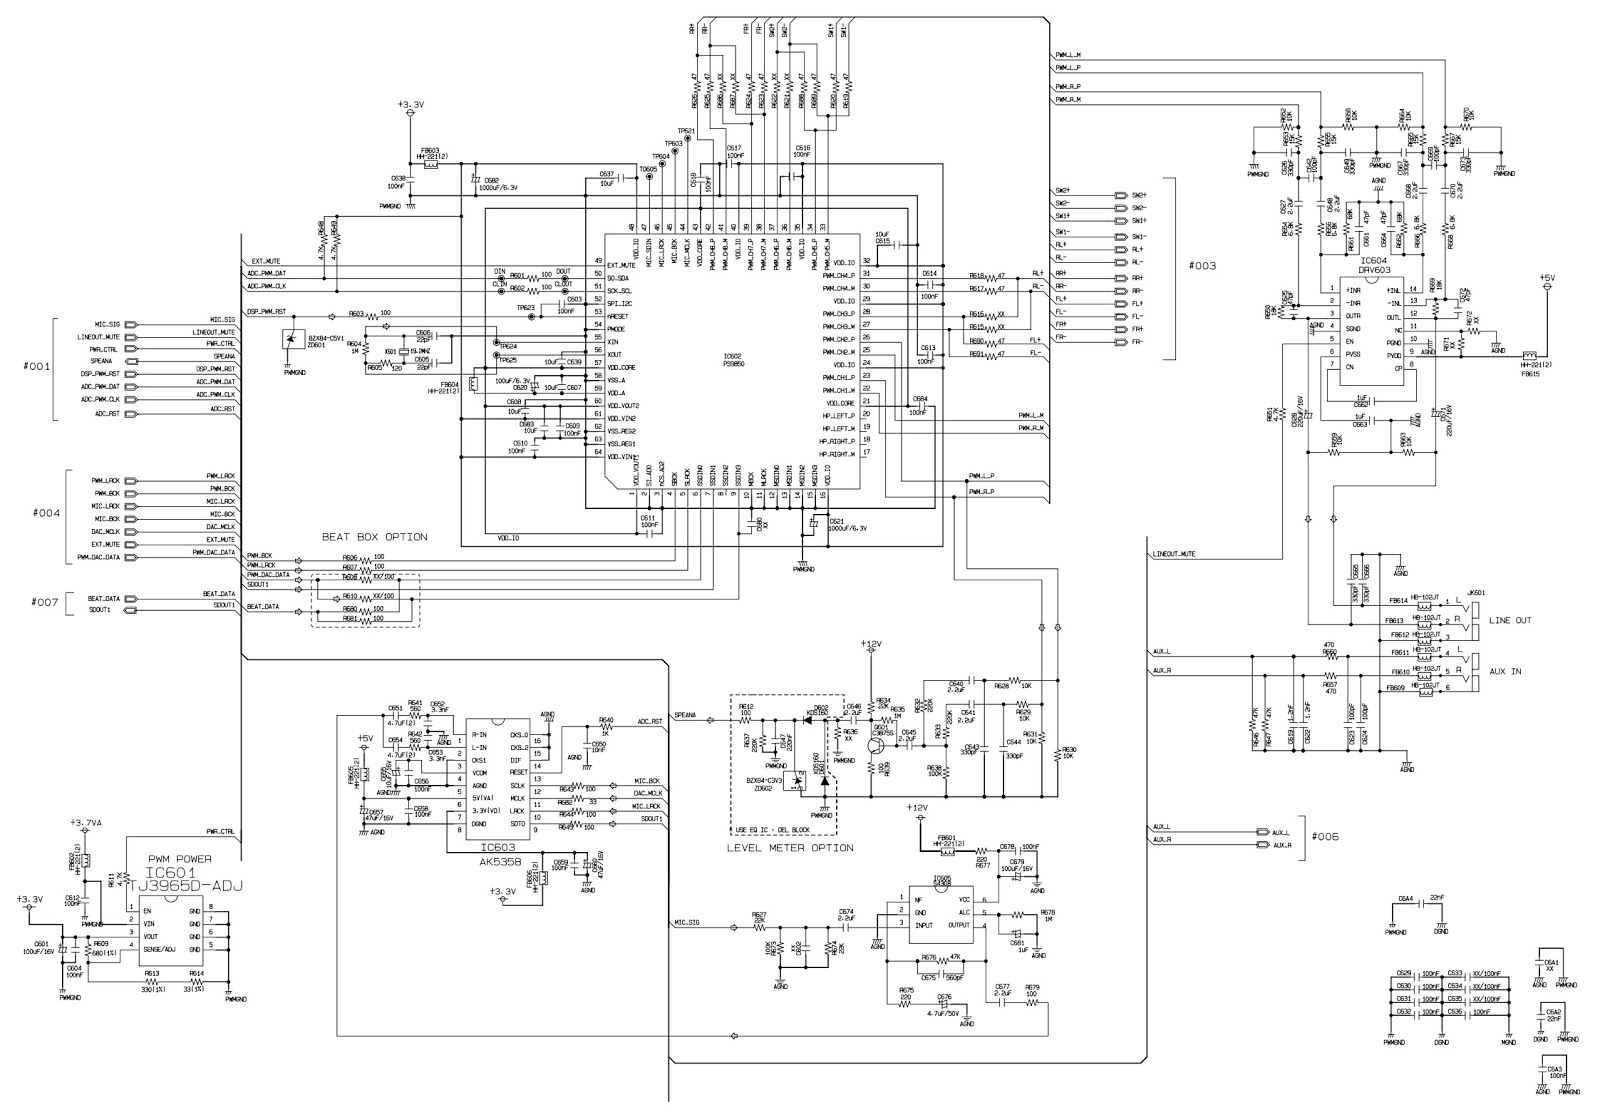 Lg Cm Mini Hi Fi System Schematic Power Supply Rf Servo Dsp